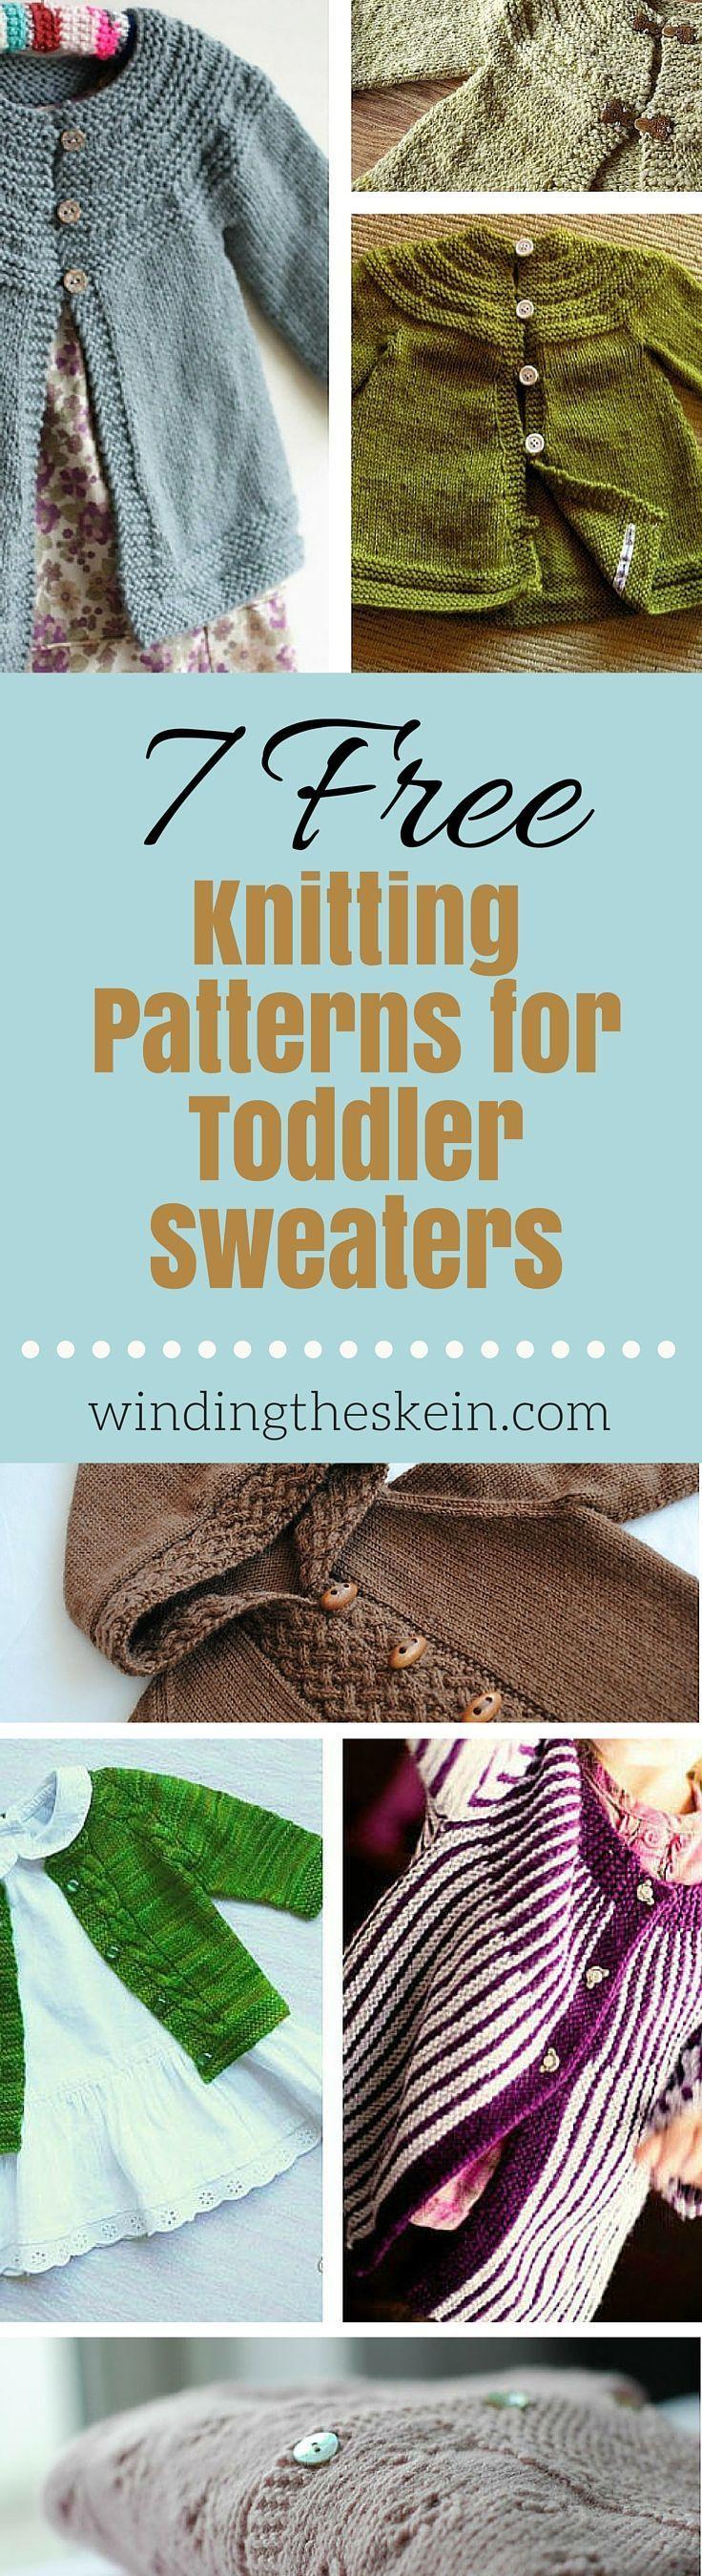 Baby Knitting Patterns Free Toddler Sweater Knitting Patterns - Winding the Skein